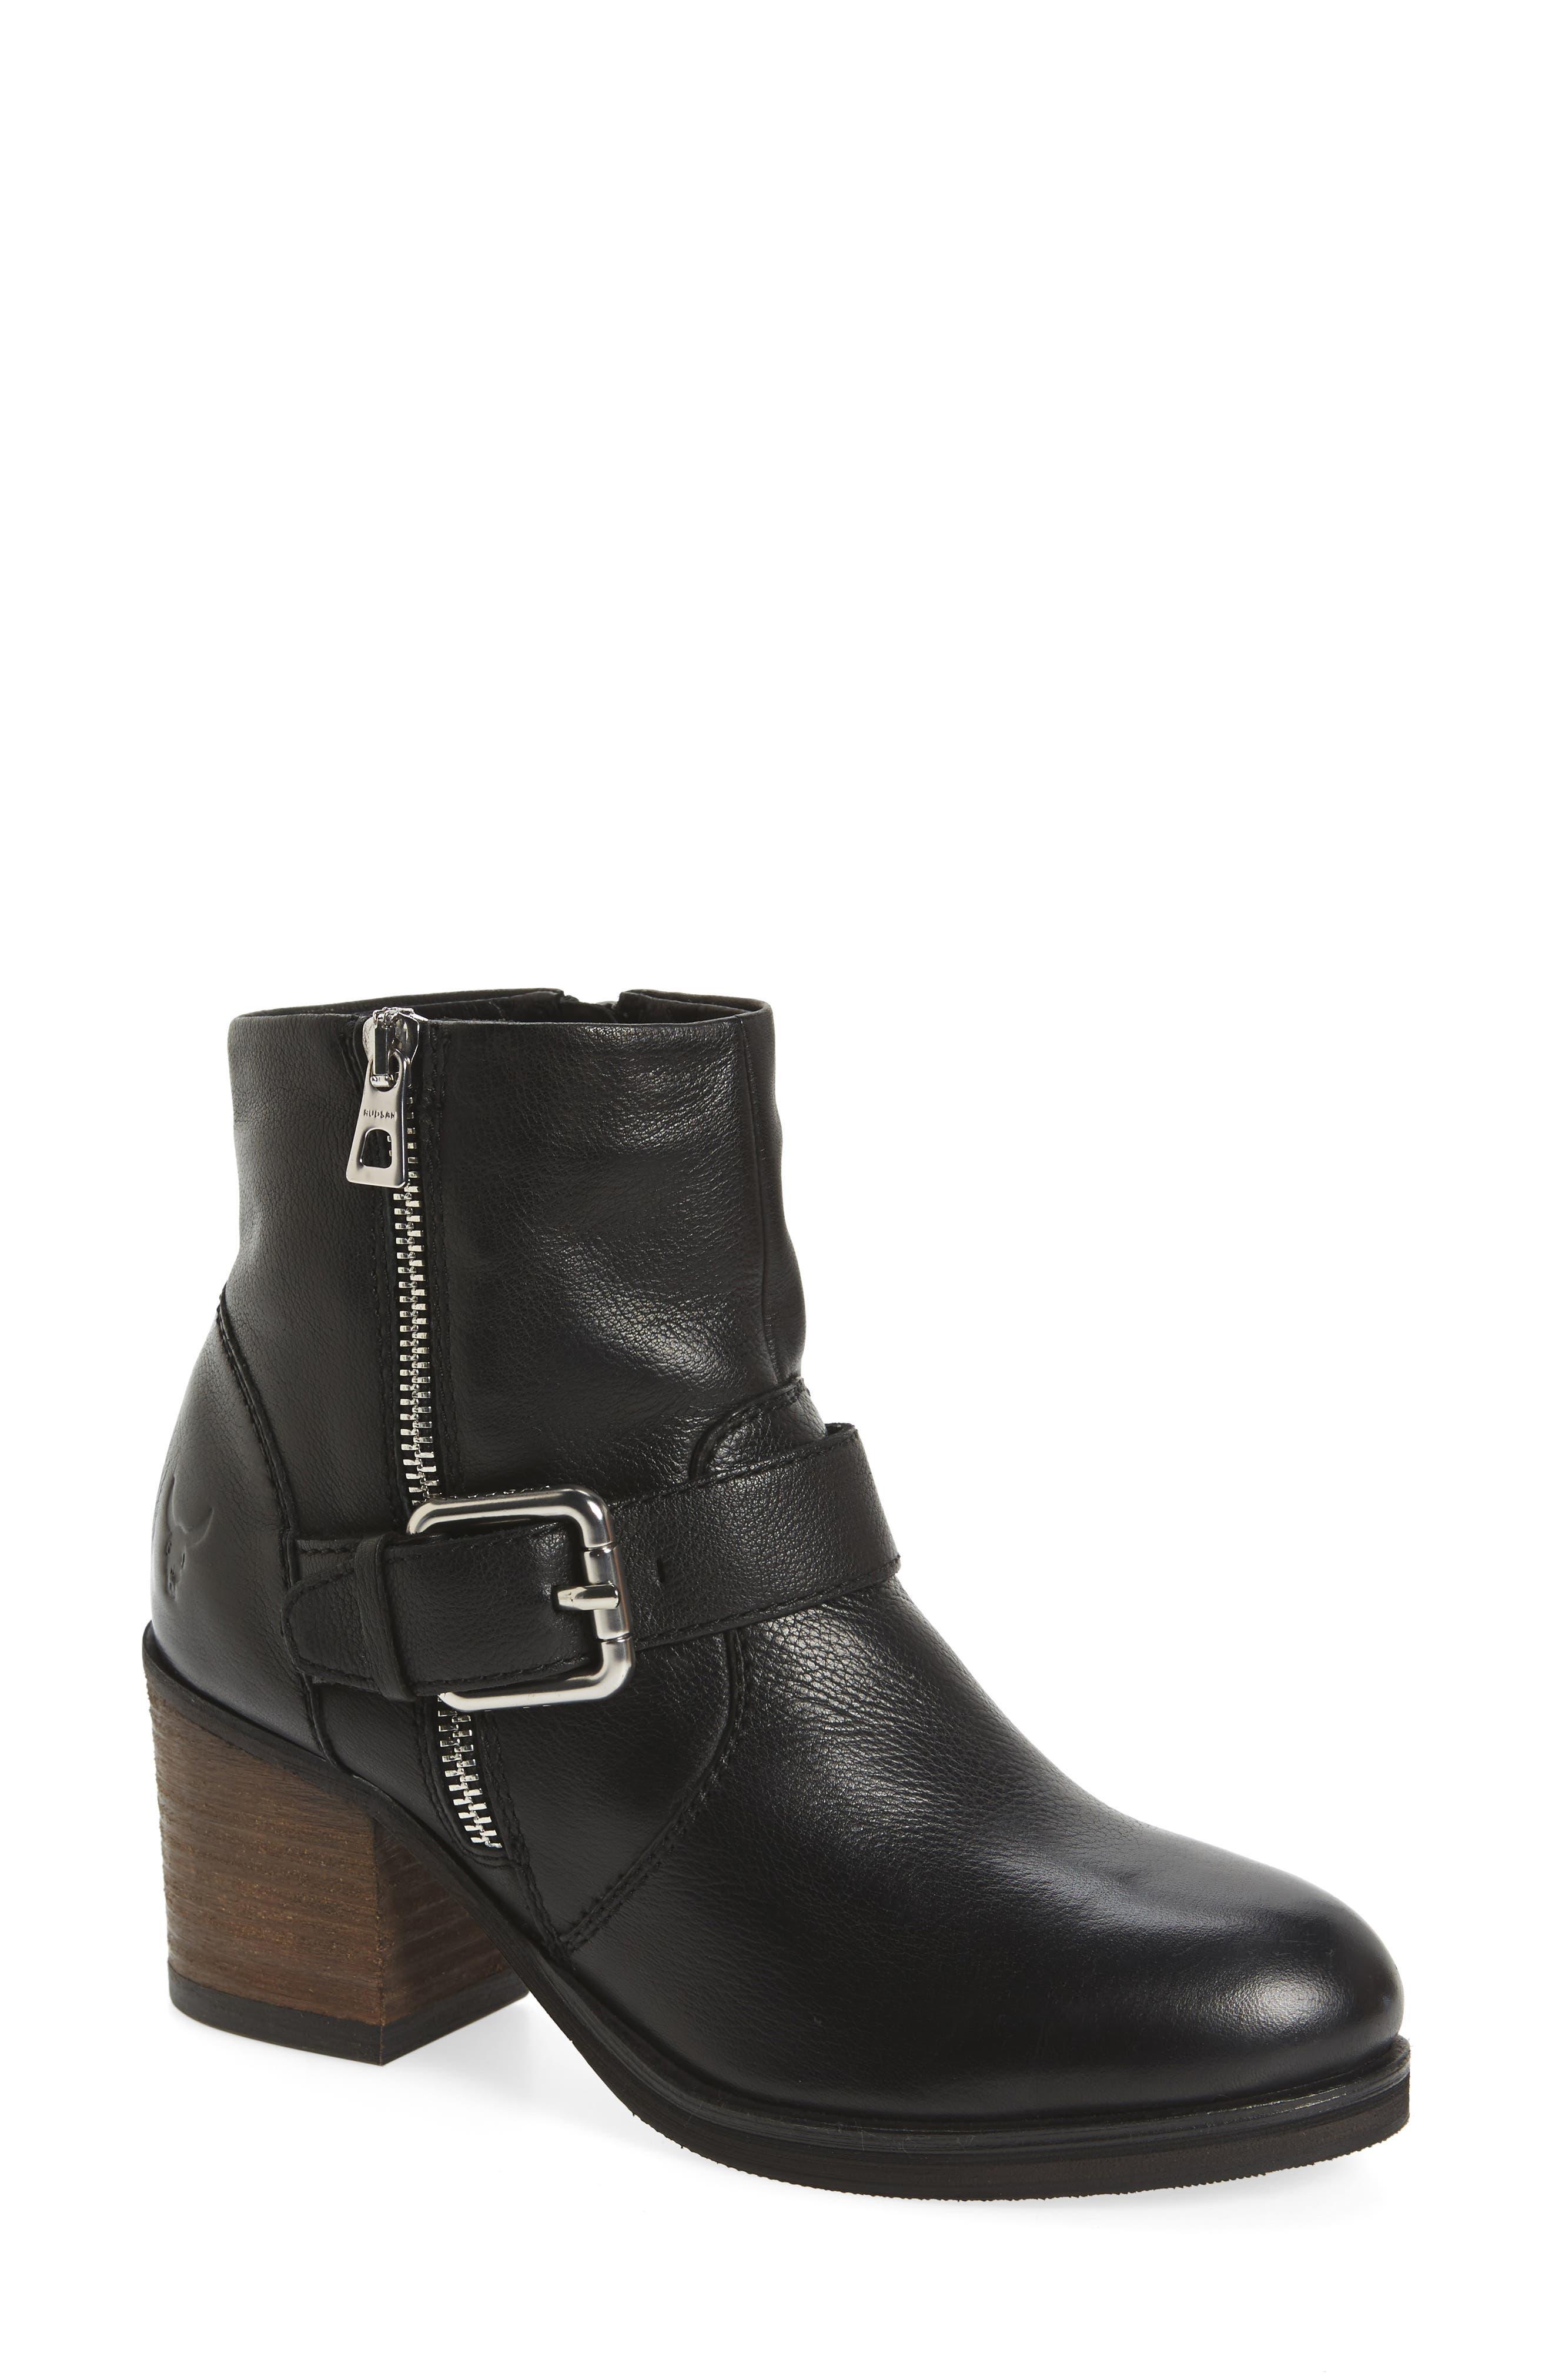 Balady Boot,                         Main,                         color, Black/ Black Leather